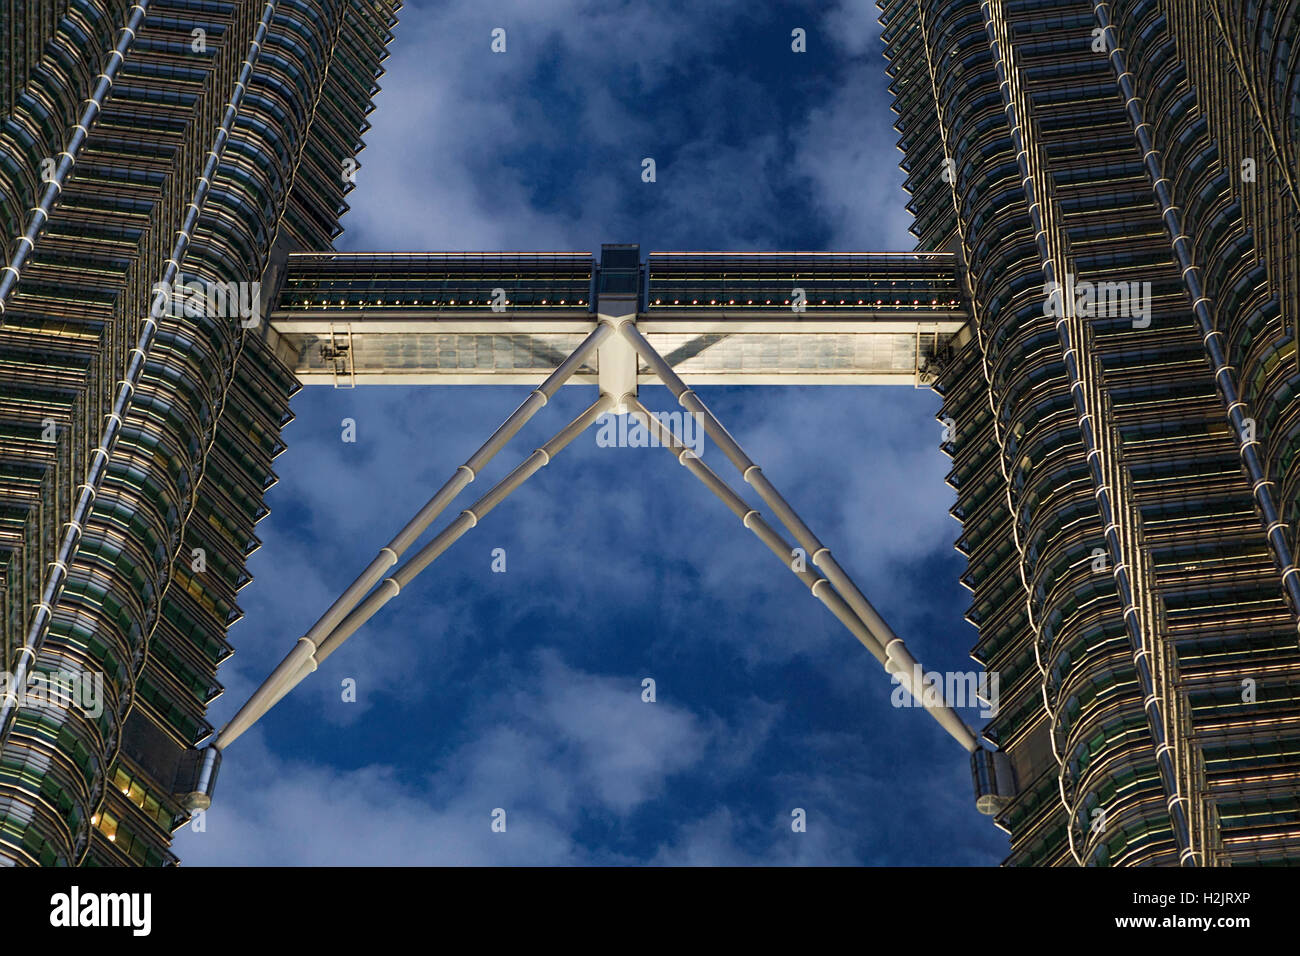 Skybridge of the Petronas Twin Towers at dusk in Kuala Lumpur, Malaysia, Southeast Asia. - Stock Image